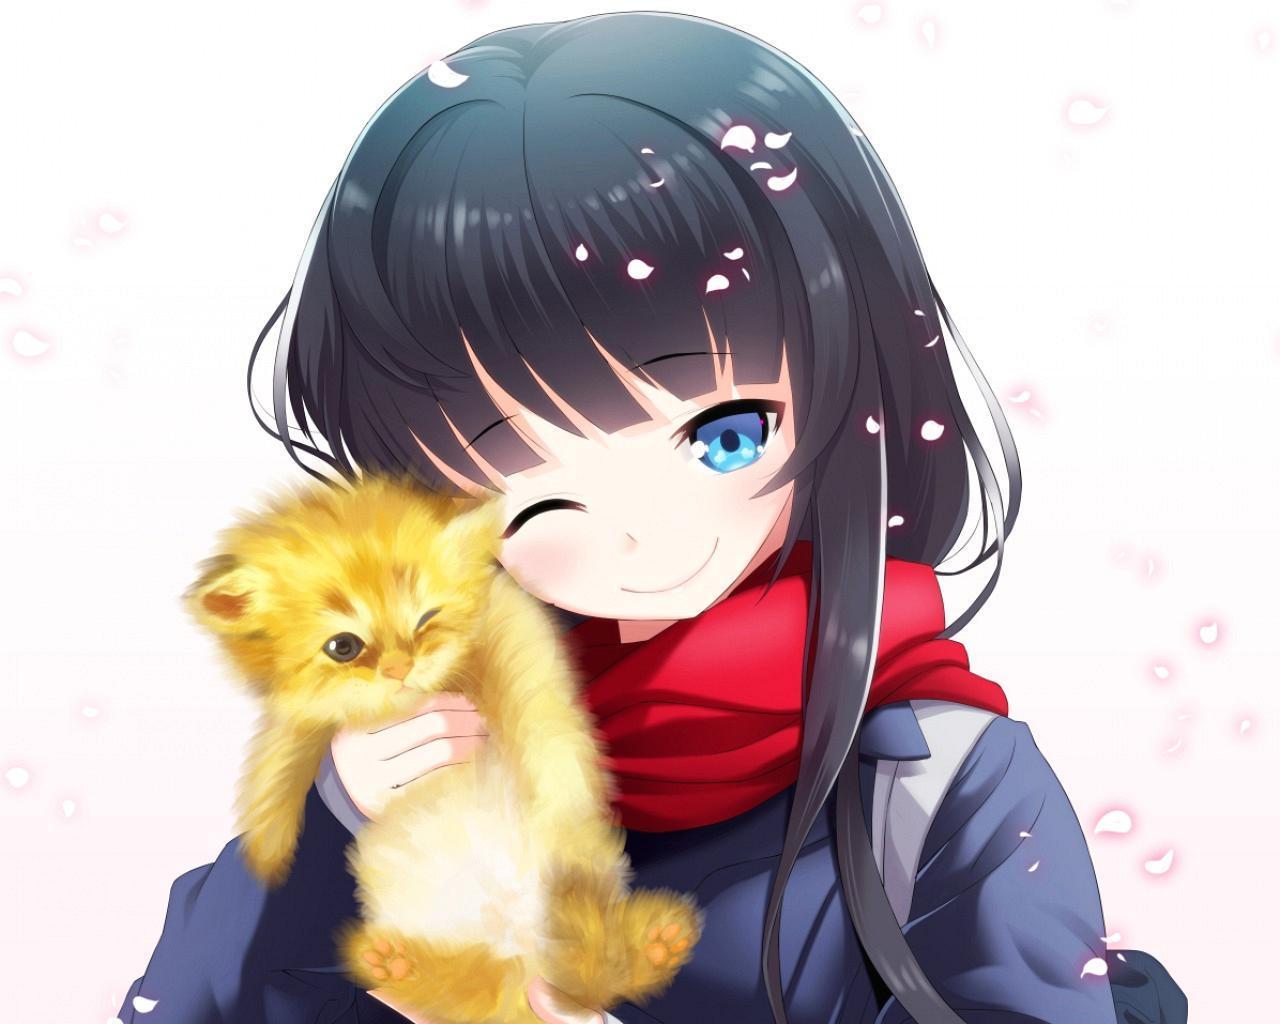 Japanese Anime Girl Wallpapers - Top Free Japanese Anime Girl